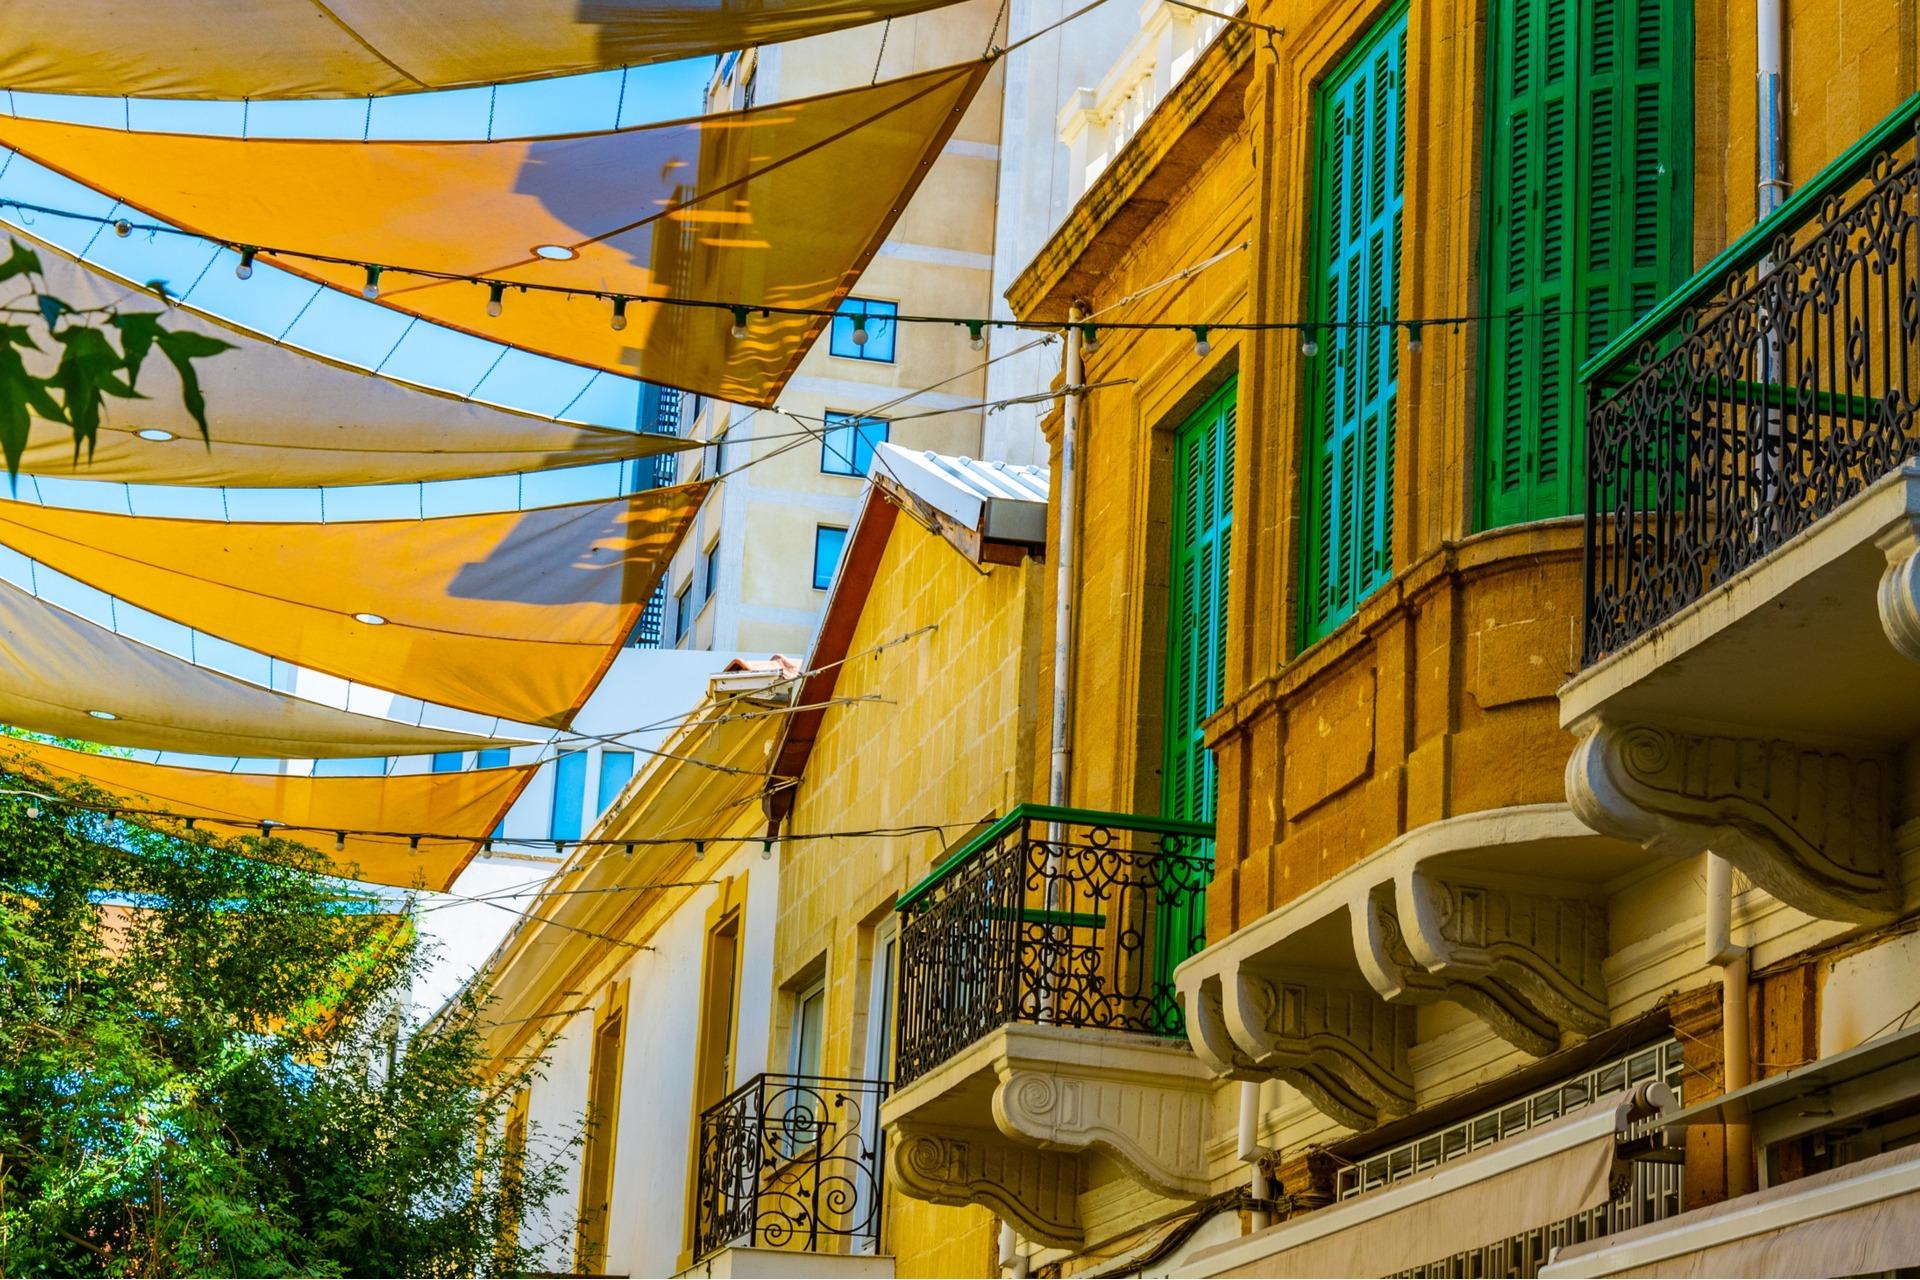 Ledra street - The Main Shopping Avenue of Nicosia, Cyprus